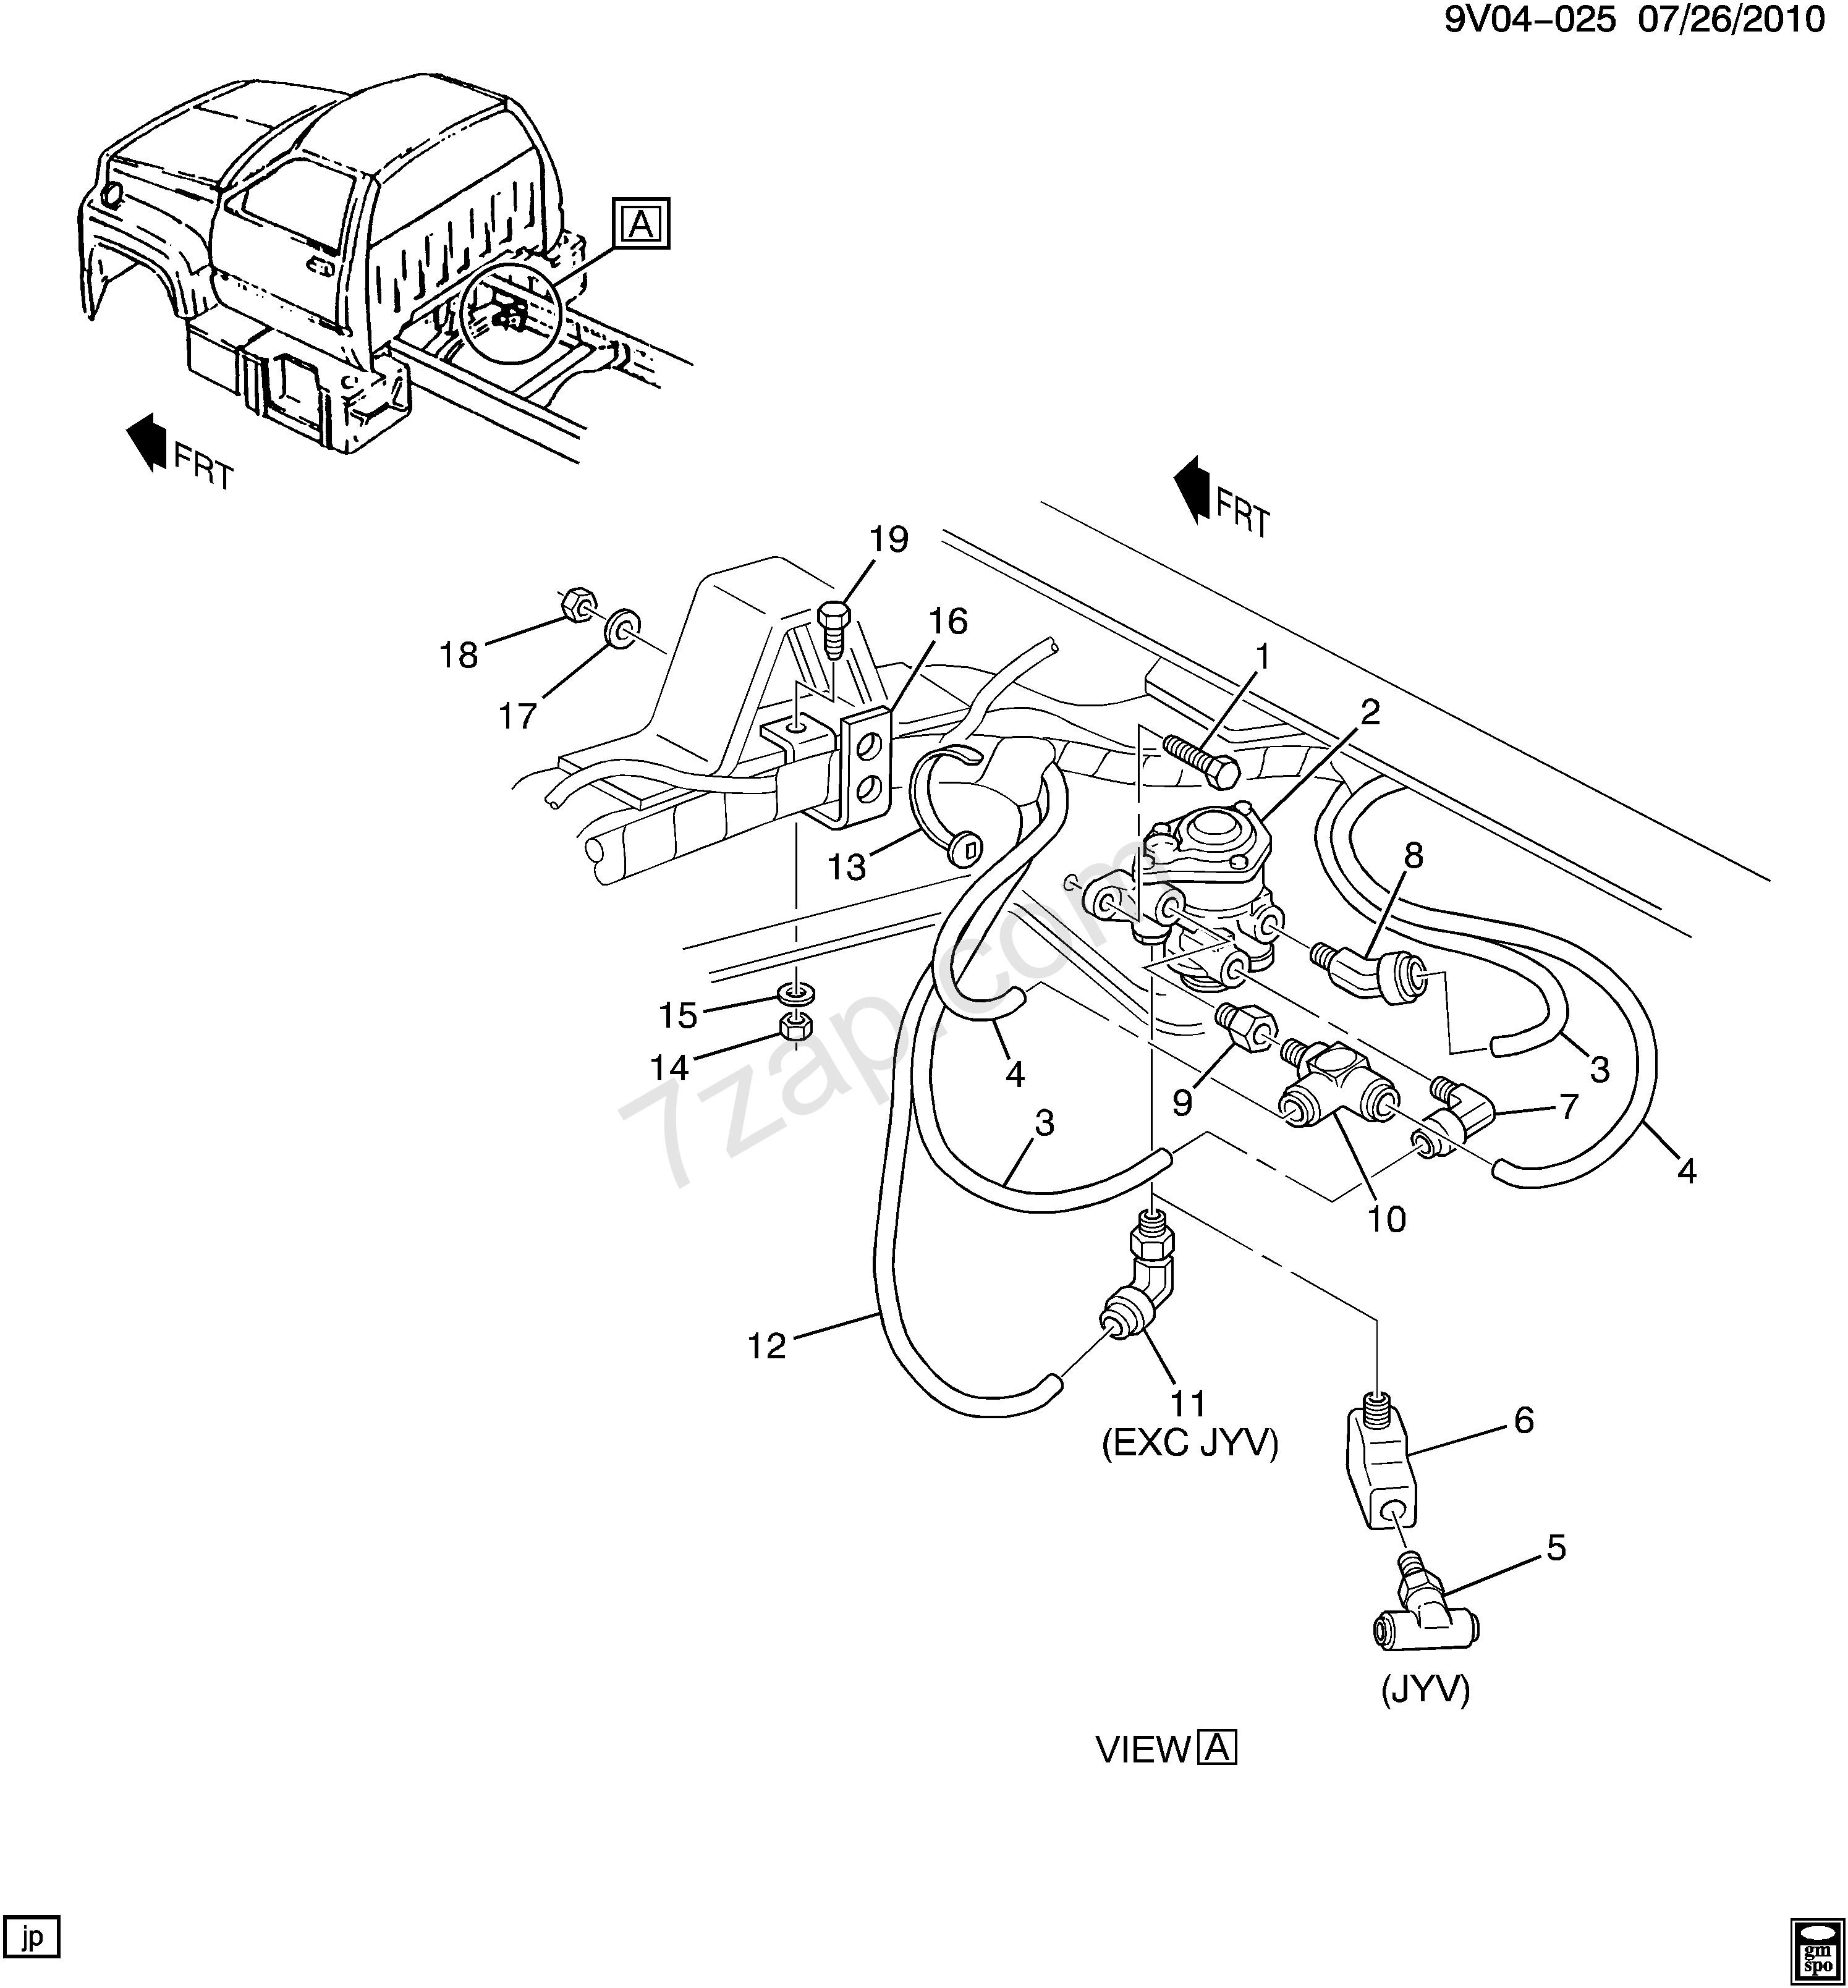 Air Brake Parts Diagram 2002 2008 C6h0 7h0 42 Air Brake Park Control Valve Mounting to Of Air Brake Parts Diagram